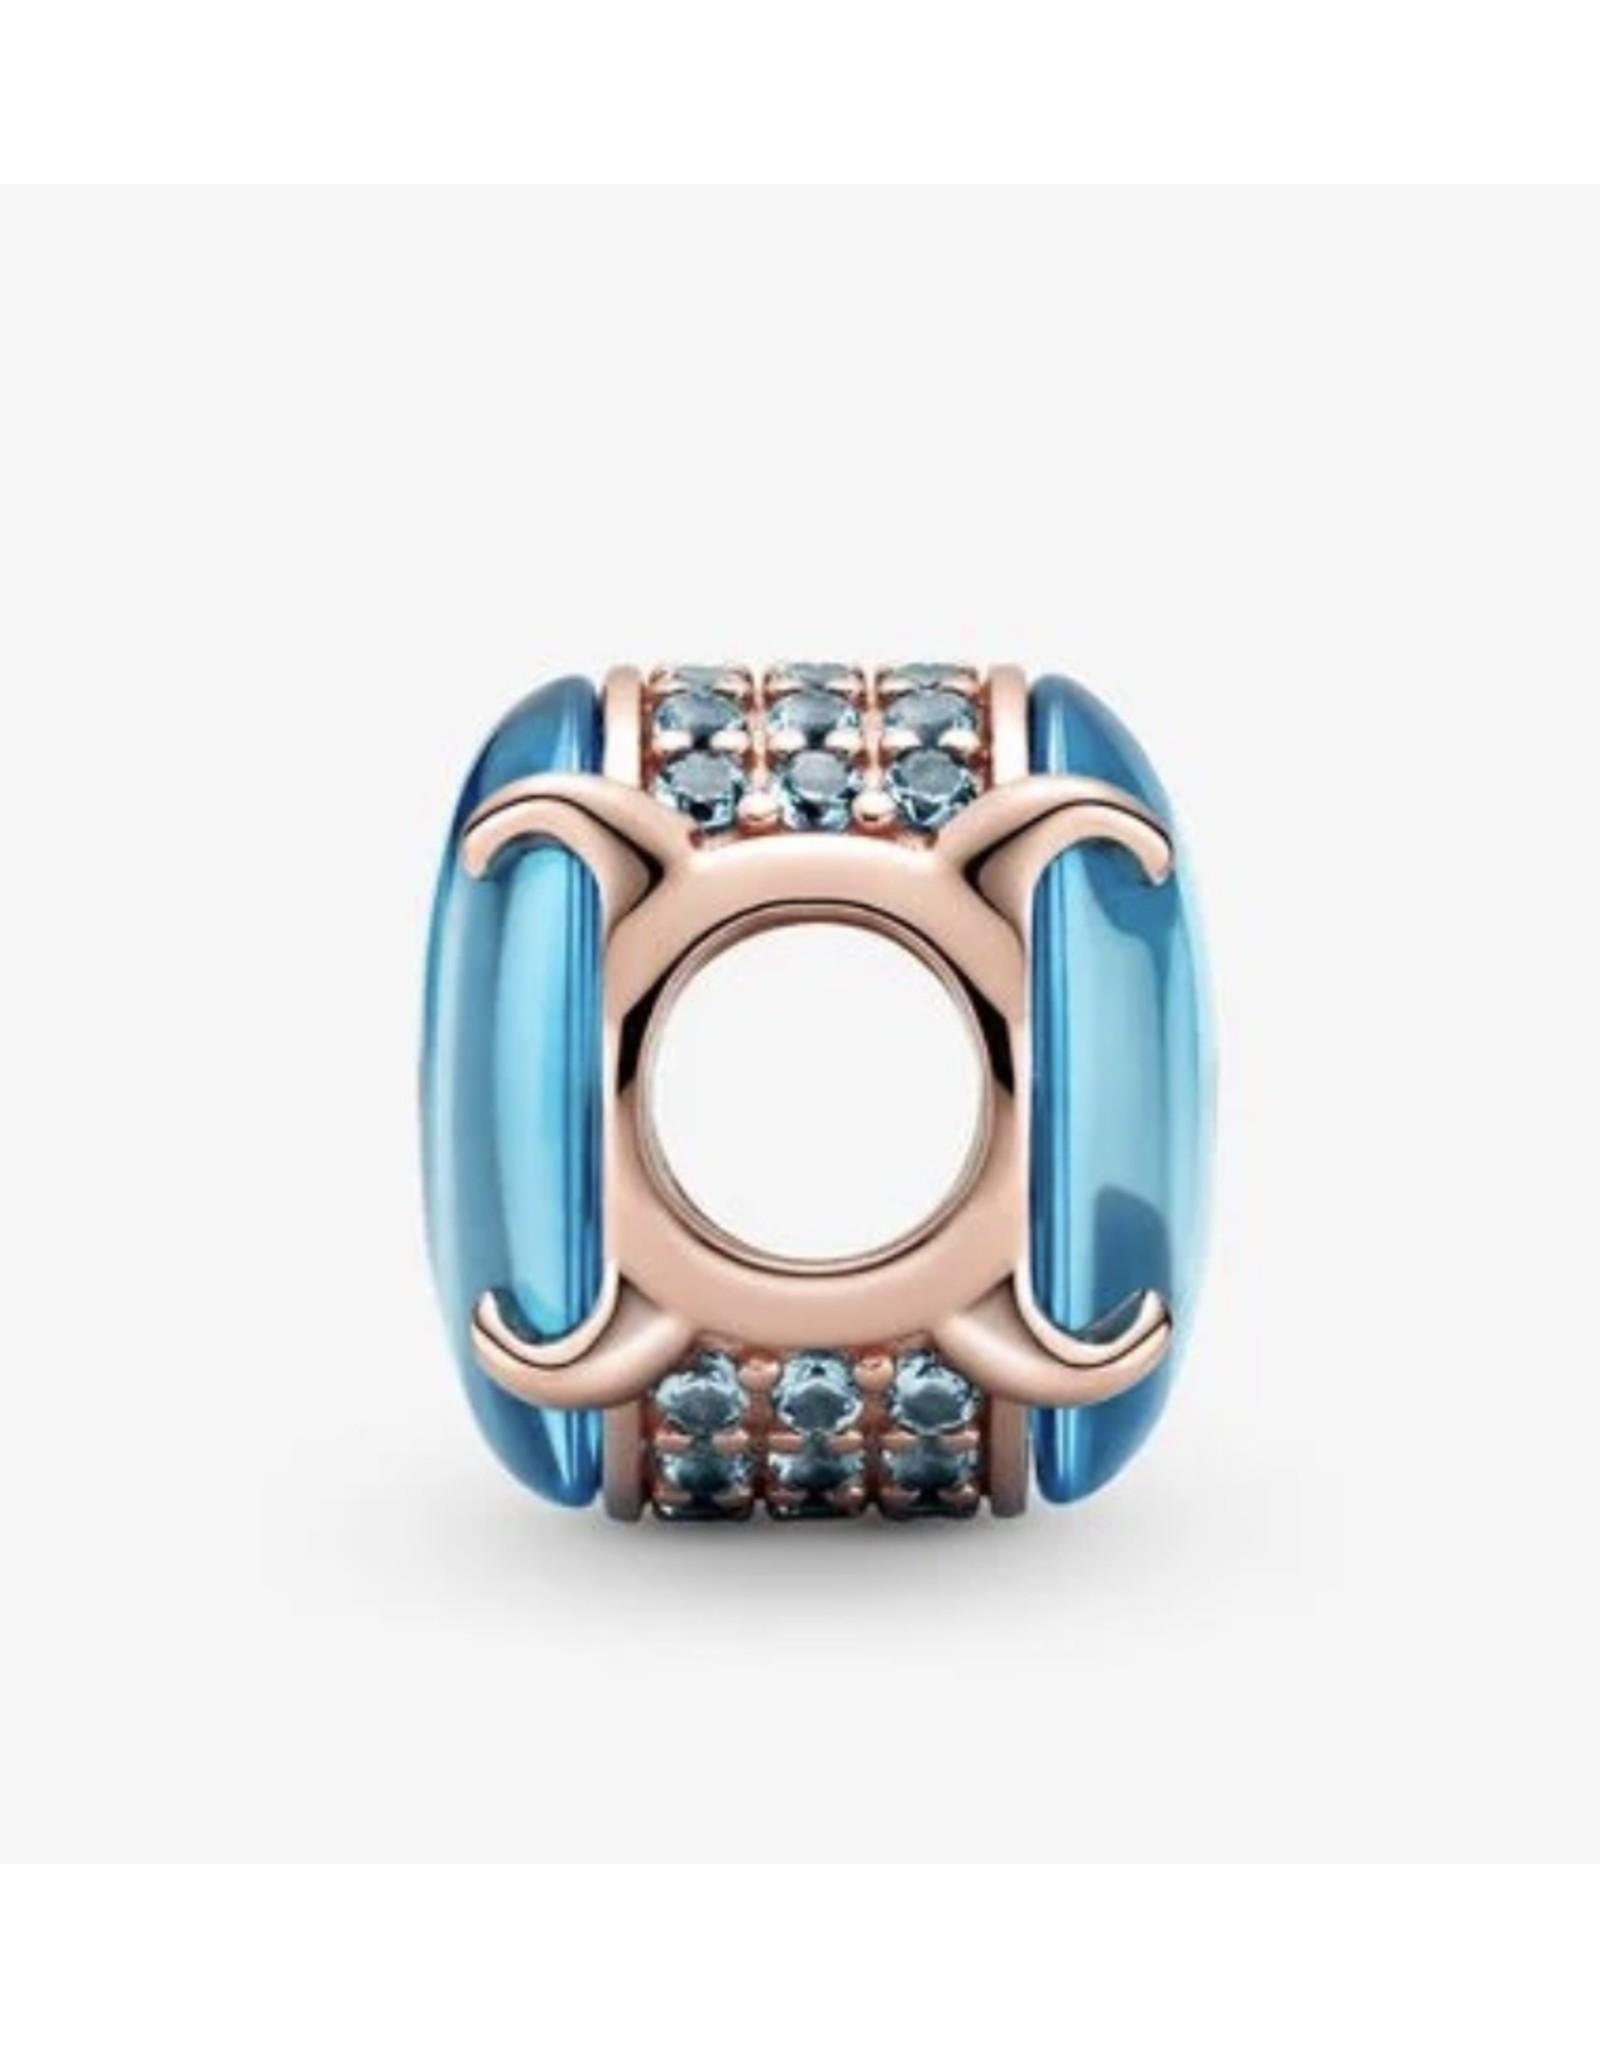 Pandora Pandora Charm,789309C01, Oval Cabochon, Blue Crystal,Rose Gold